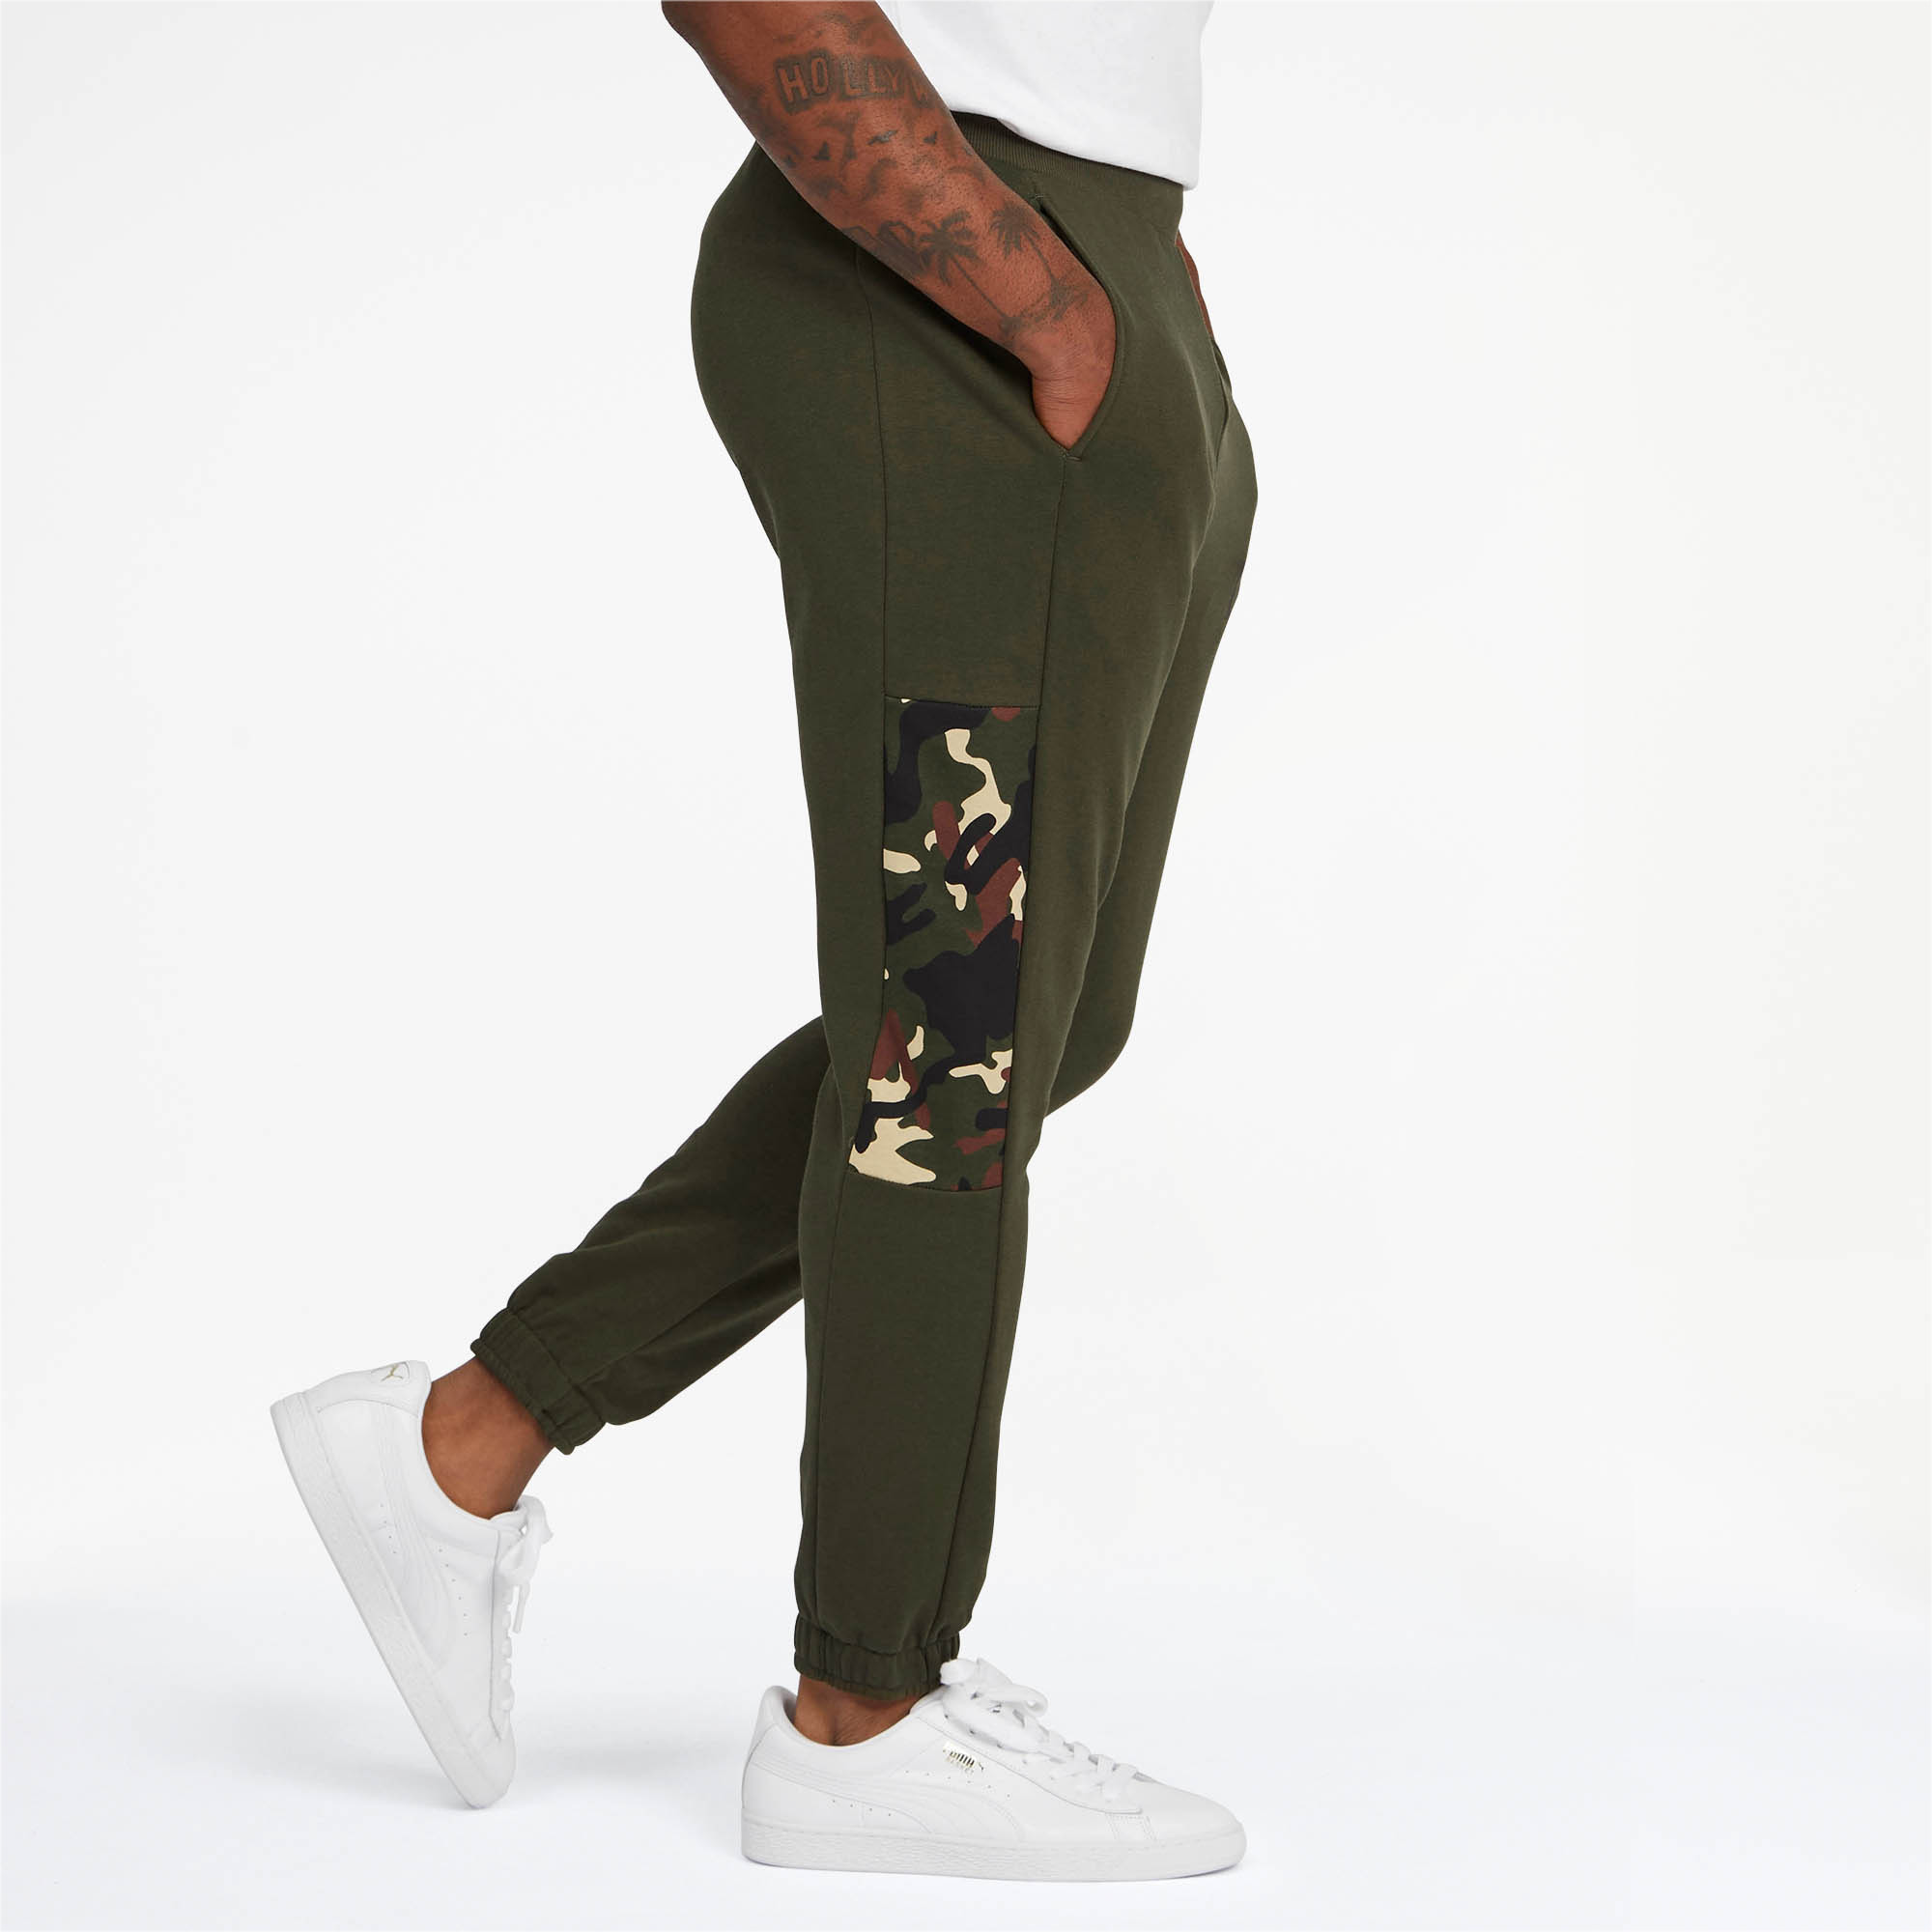 PUMA-Rebel-Camo-Men-039-s-Pants-Men-Knitted-Pants-Basics thumbnail 8